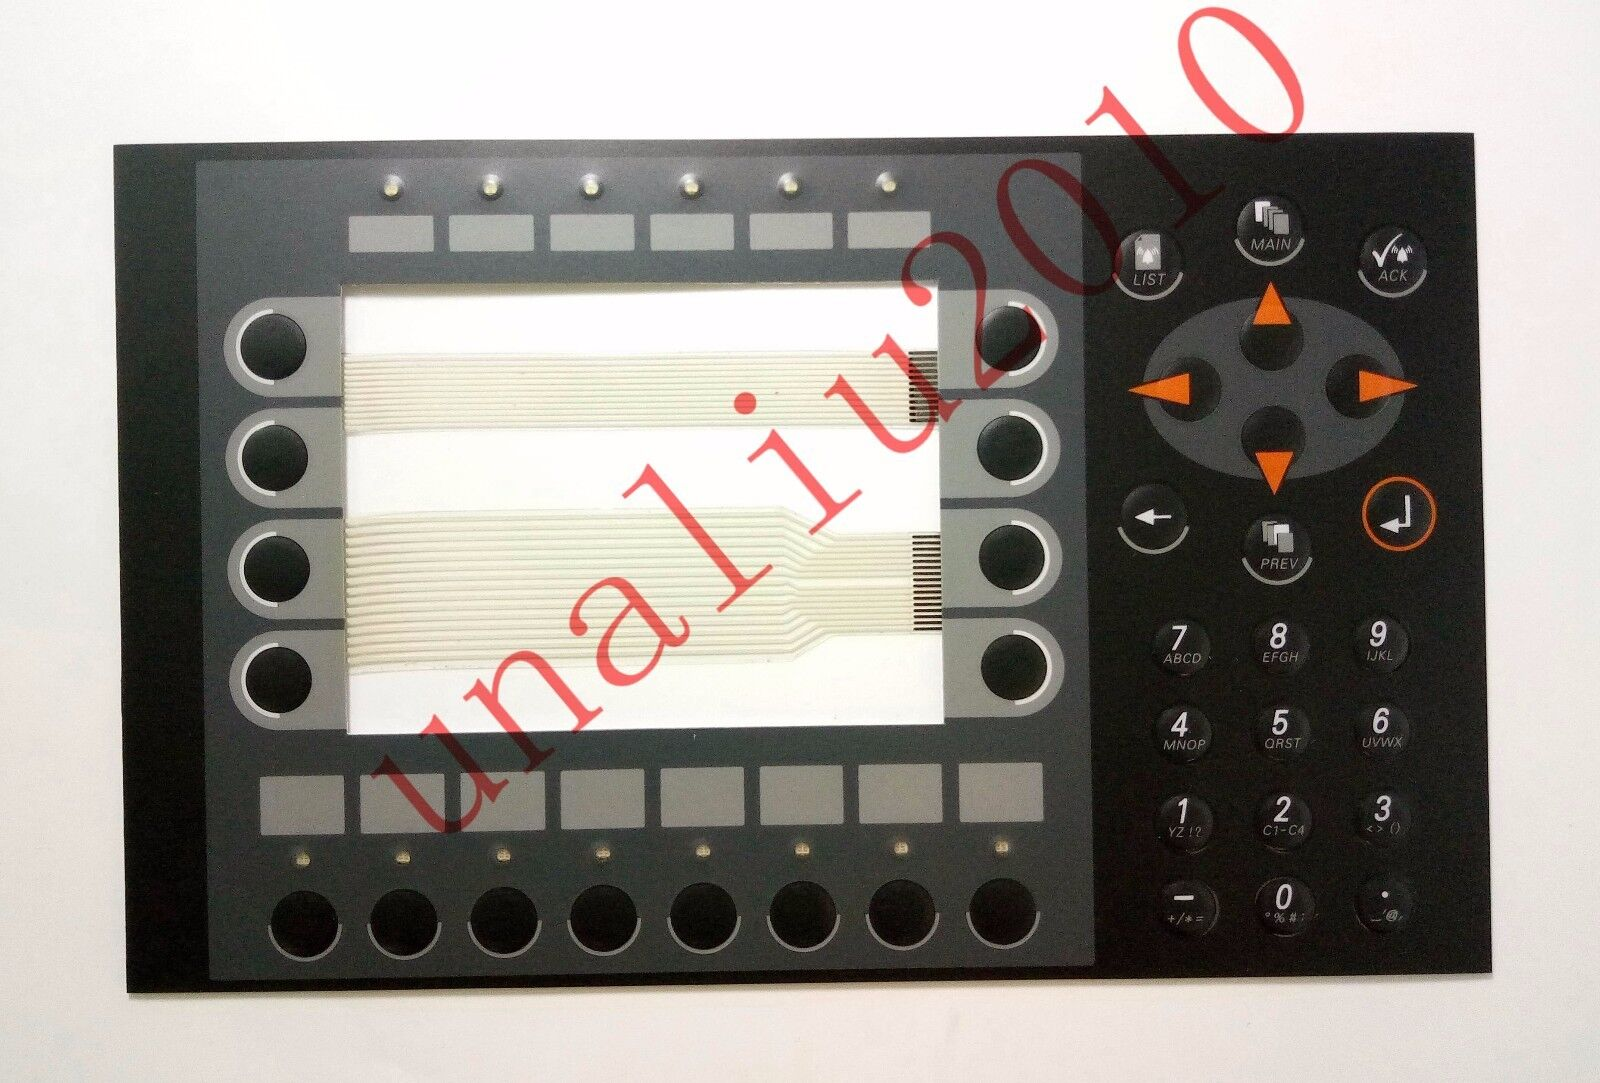 1pc Mitsubishi Beijer Membrane Keypad MAC E700 02440A B E G